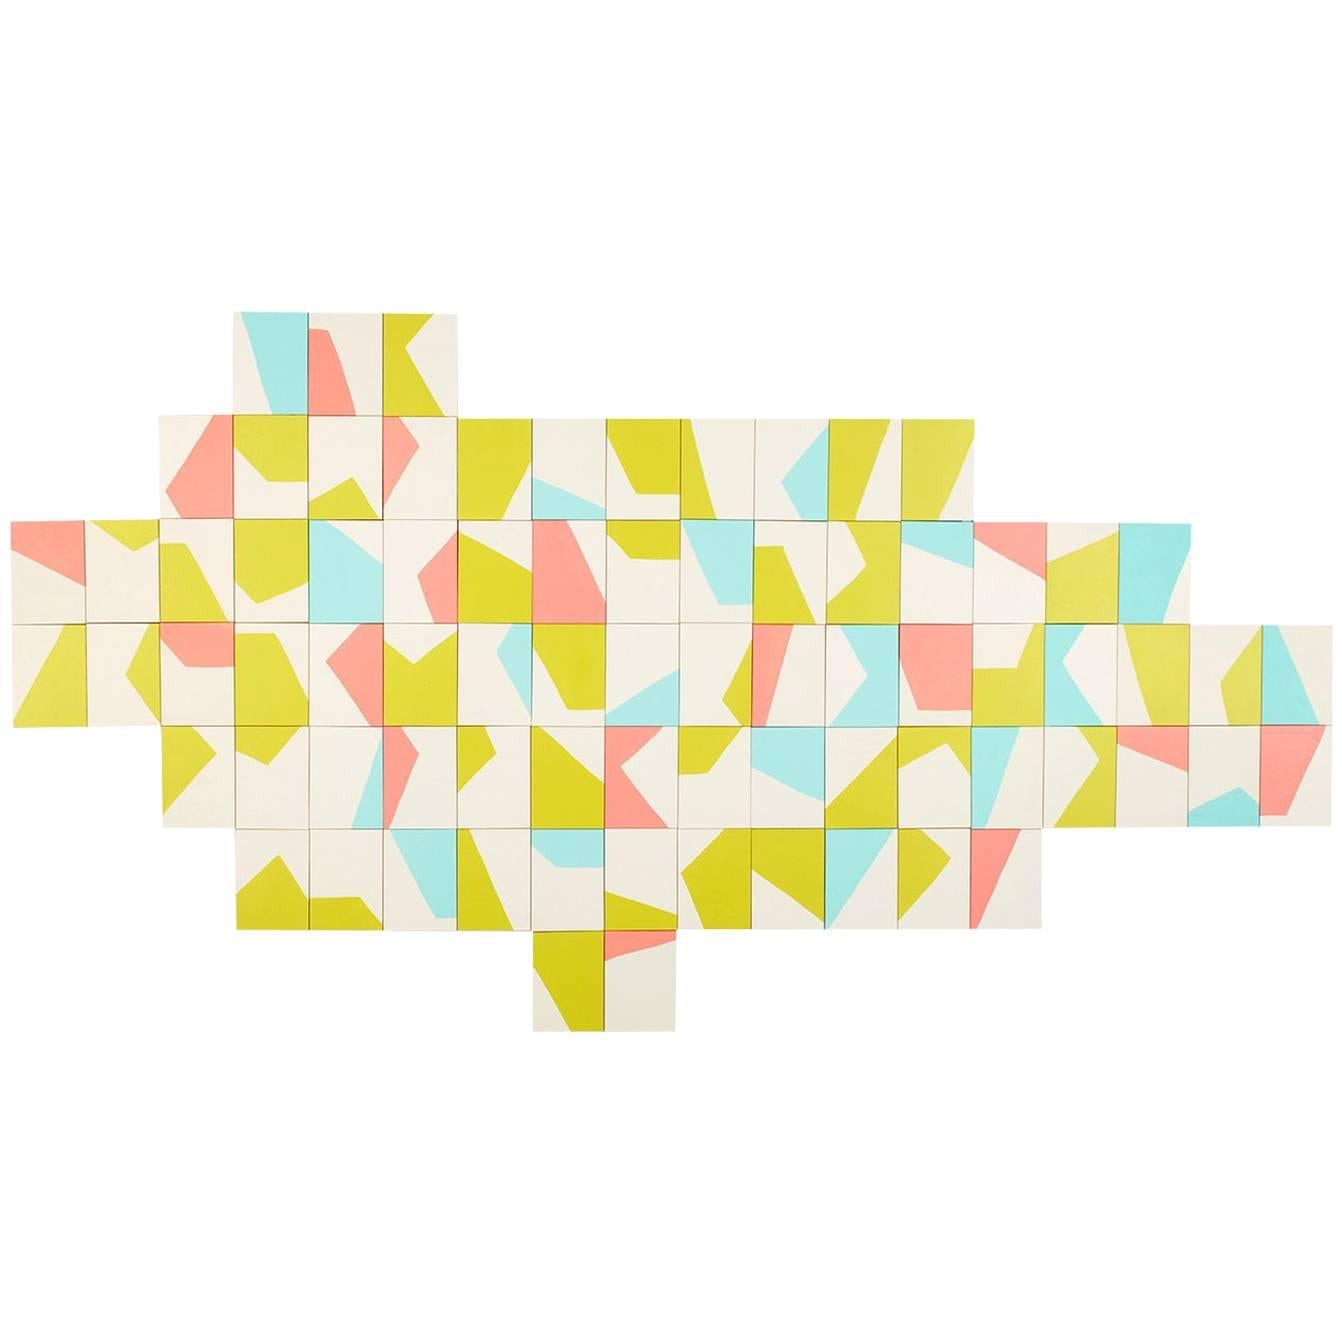 Angela Adams Xylo Painting, Acrylic on Birch Panels, Geometric and Modern